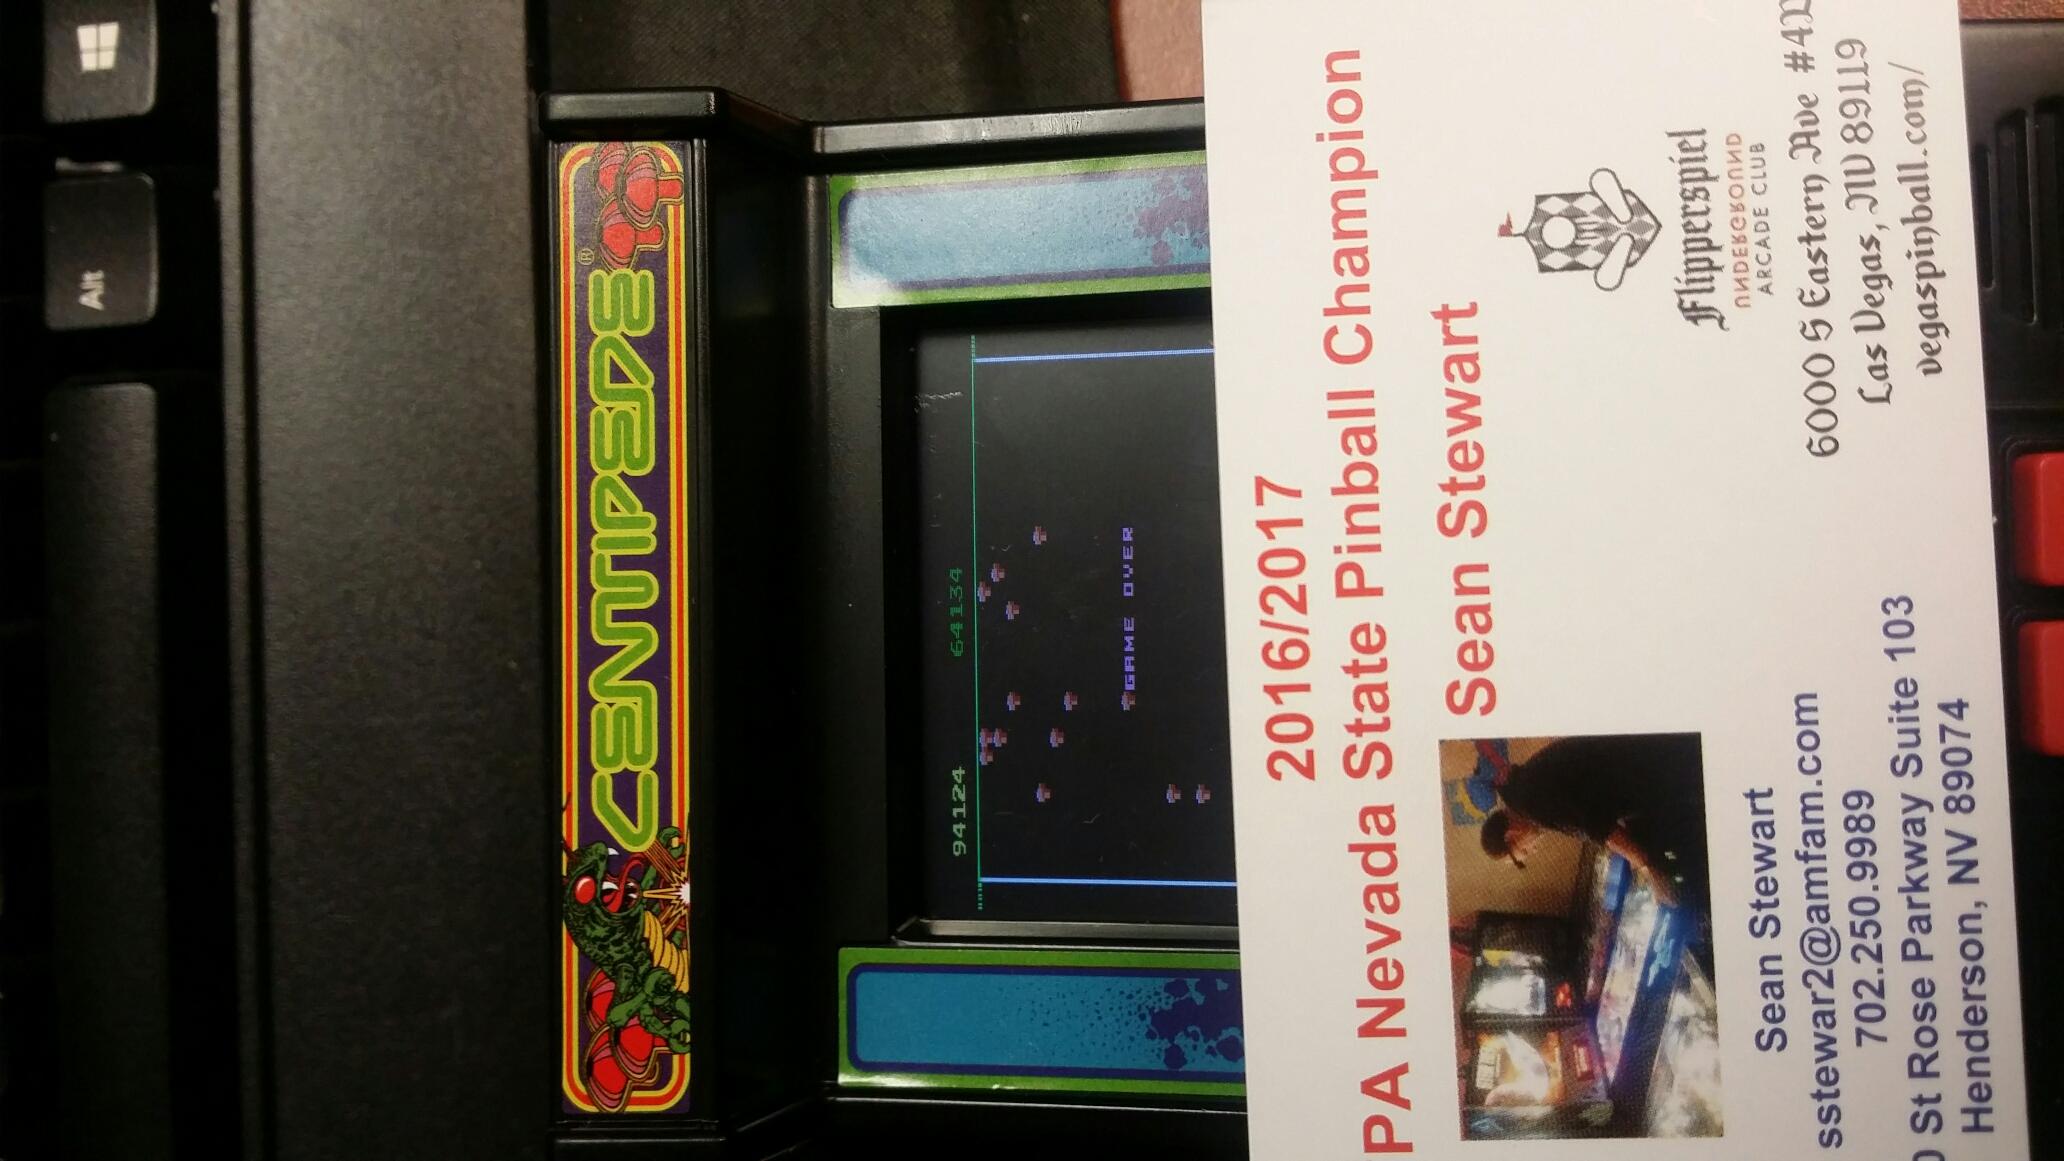 Arcade Classics 03: Centipede 94,124 points